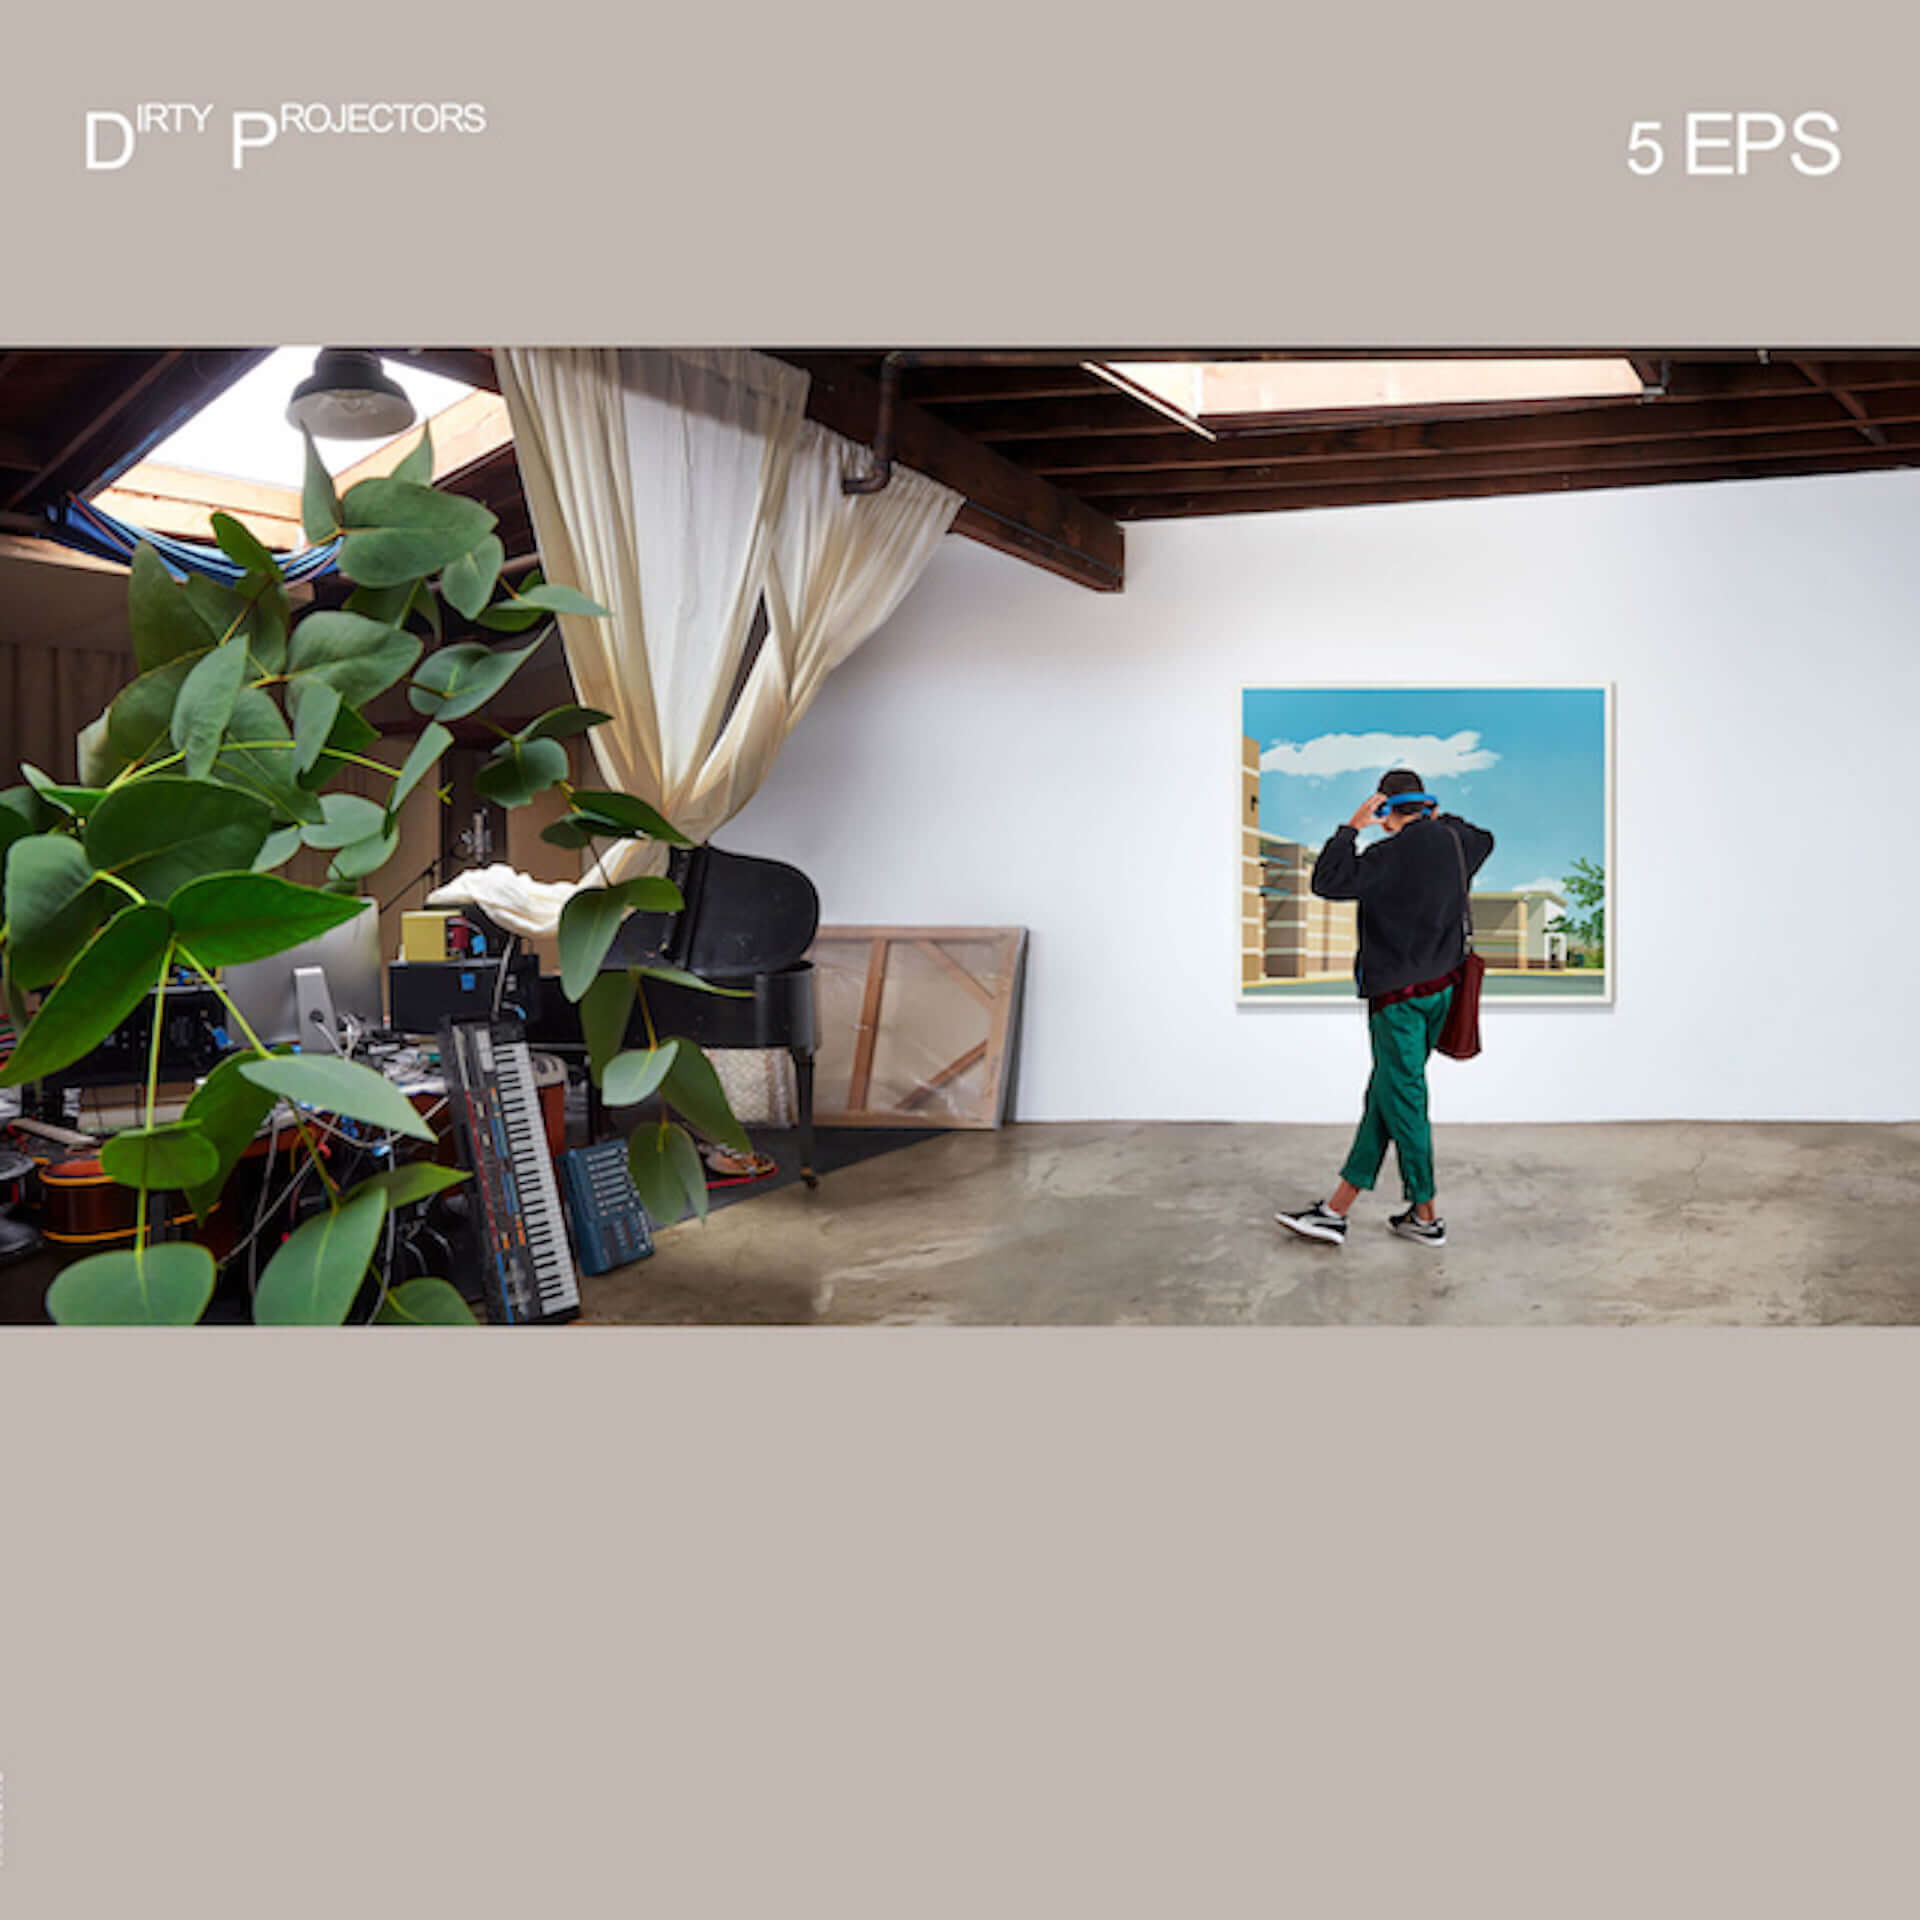 "Dirty ProjectorsのEP5作が収録された最新アルバム『5EPs』がリリース!収録曲""My Possession""のMVも公開 music201125_dirty-projectors_3-1920x1920"